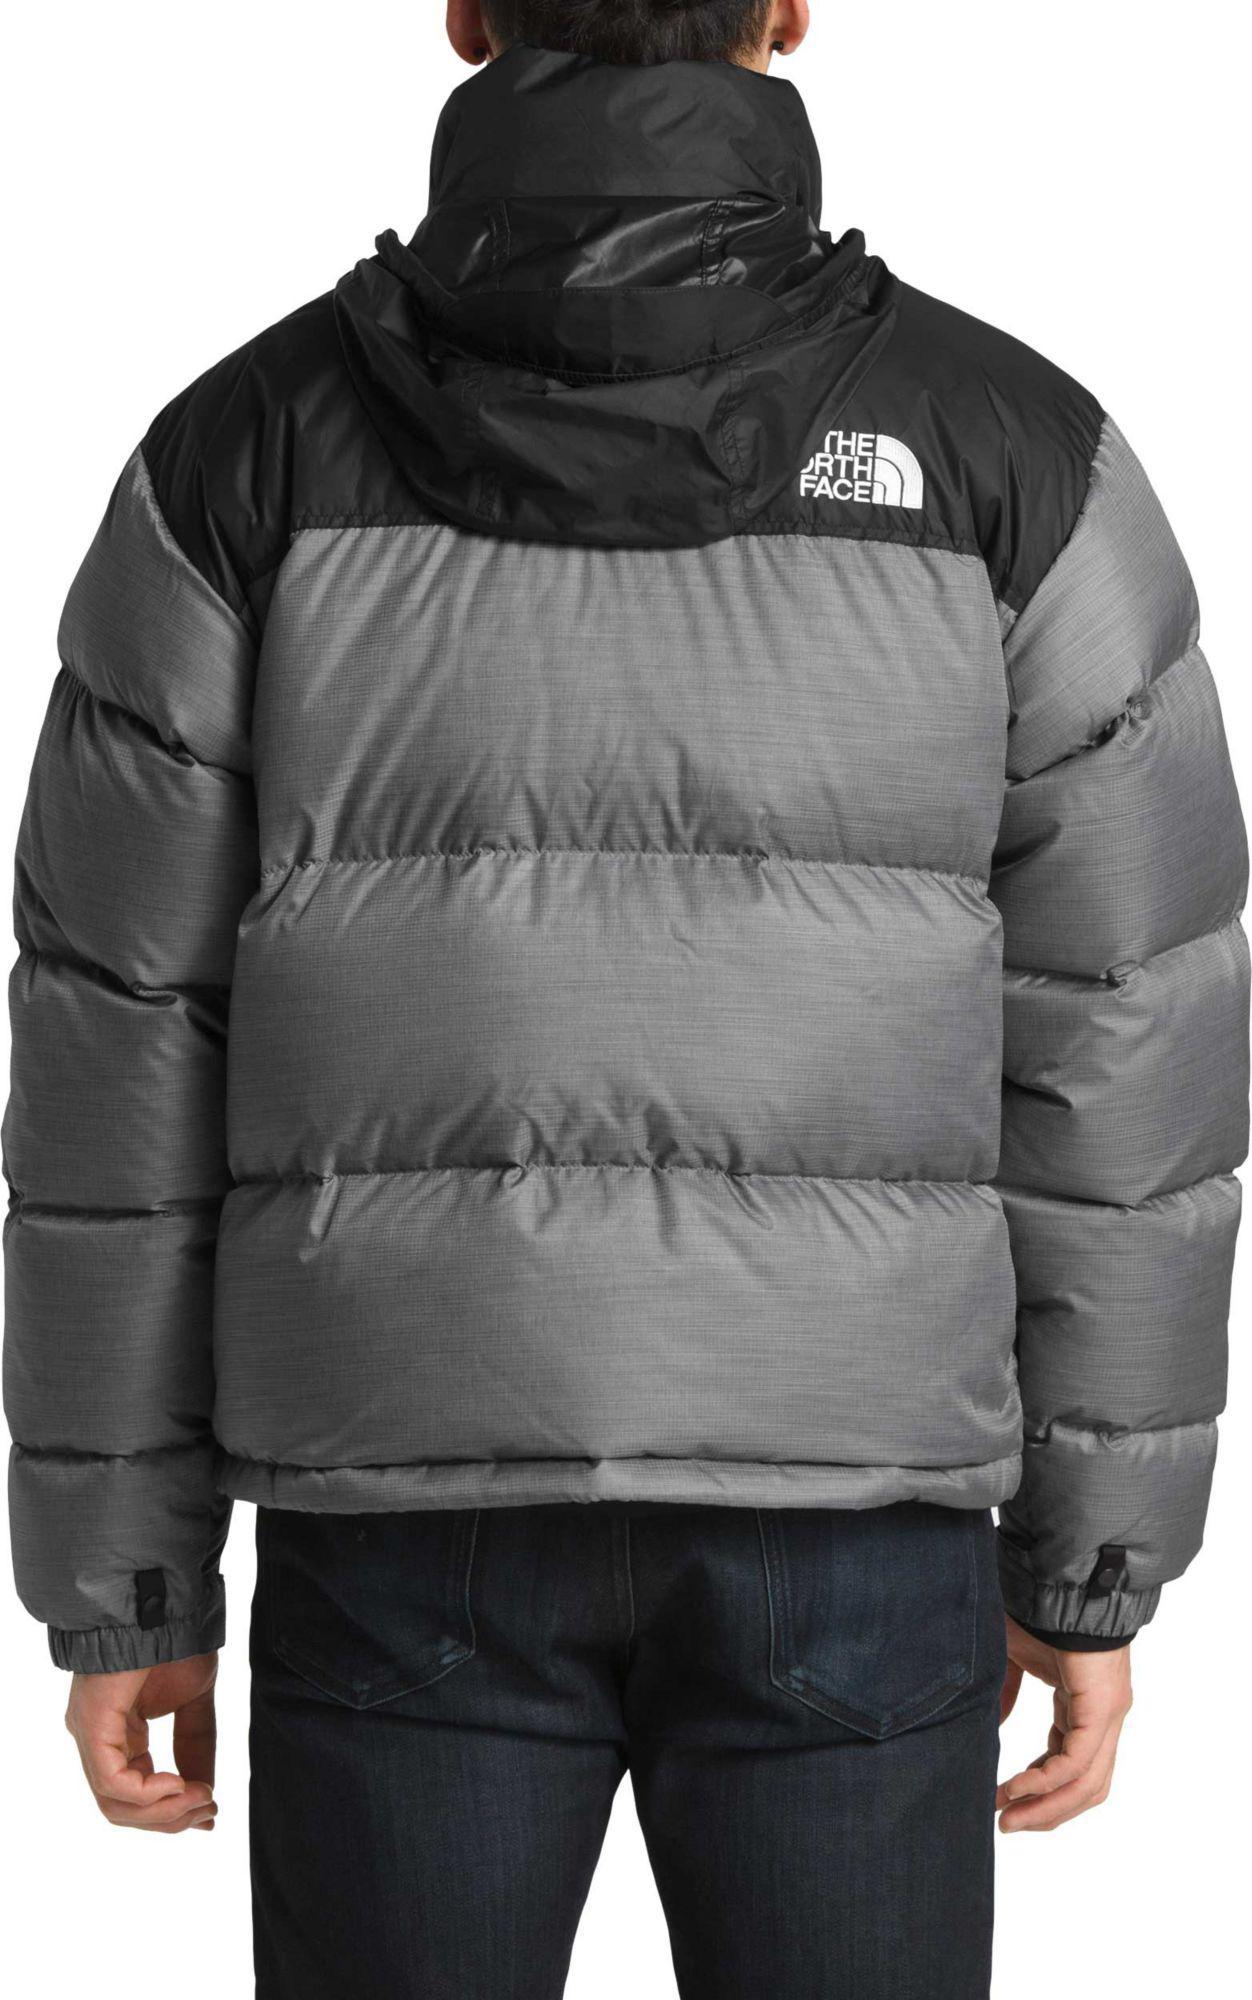 be92062f4e The North Face - Gray 1996 Retro Nuptse Jacket for Men - Lyst. View  fullscreen